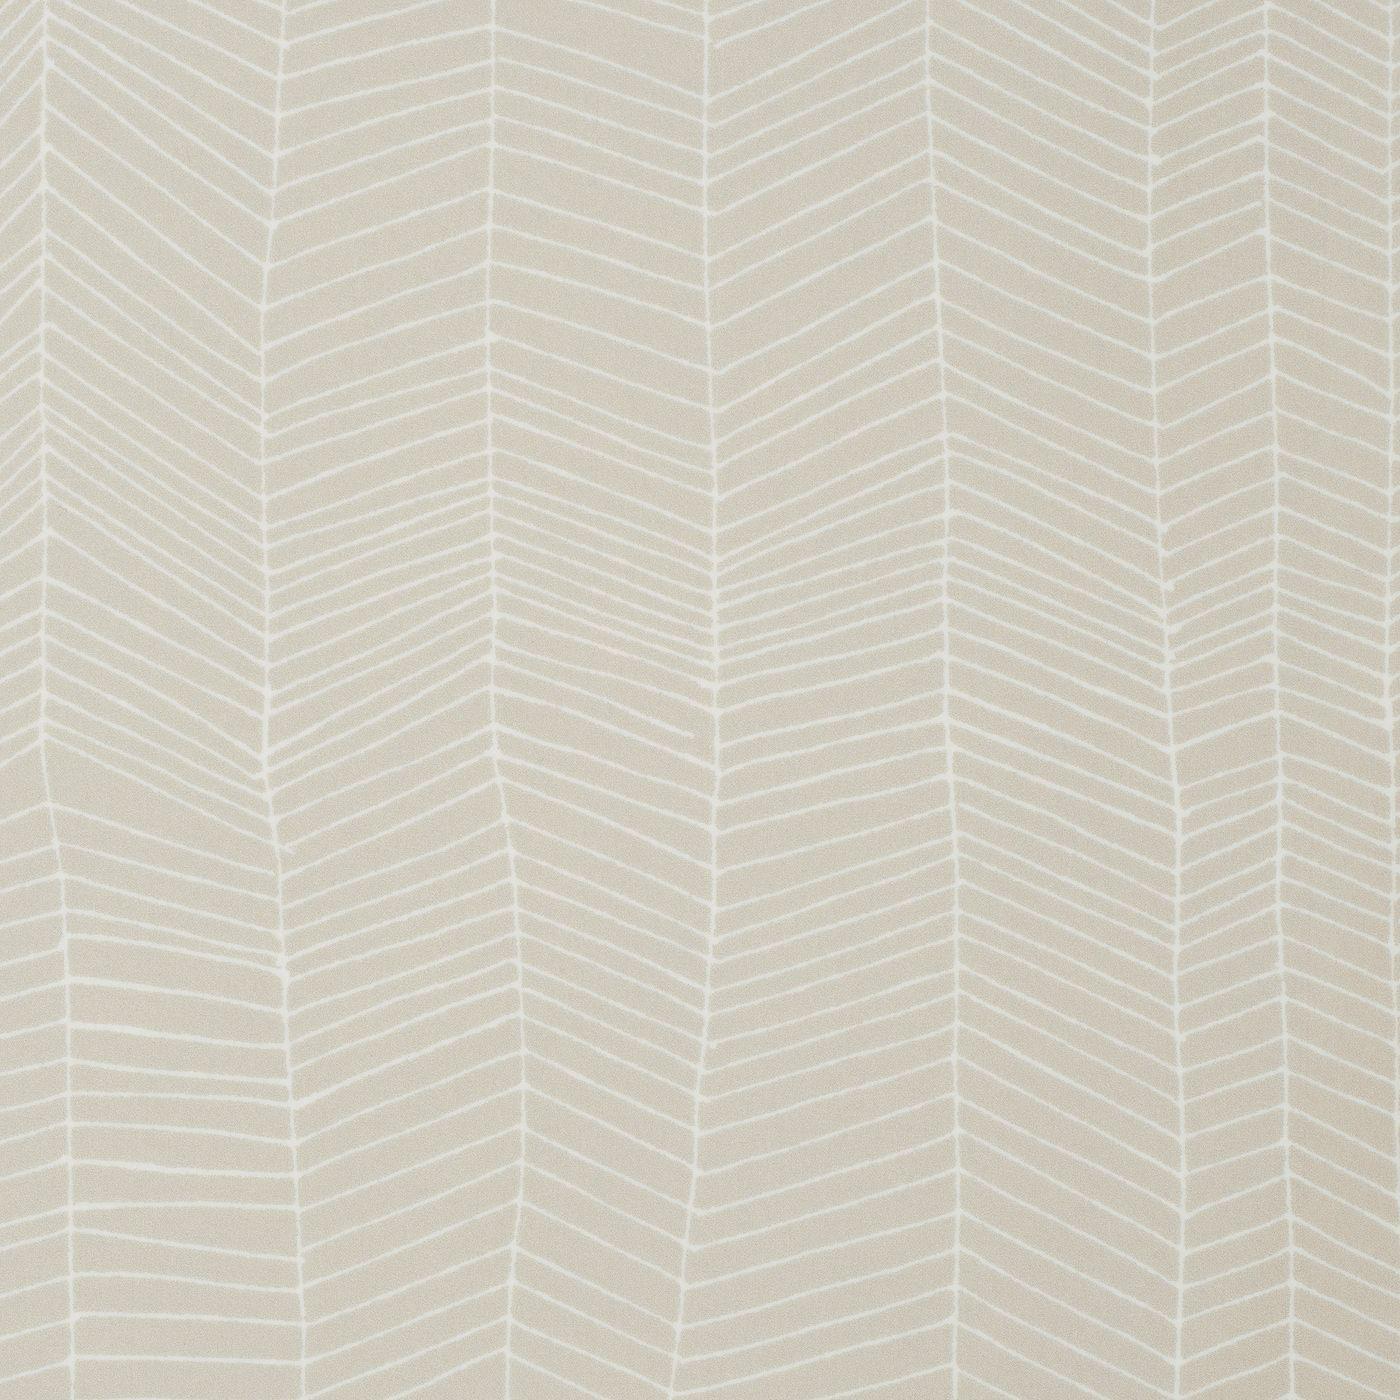 Full Size of Ekbacken Arbeitsplatte Mattiert Beige Arbeitsplatten Küche Betonoptik Ikea Kosten Miniküche Sofa Mit Schlaffunktion Betten 160x200 Sideboard Bei Wohnzimmer Arbeitsplatte Betonoptik Ikea